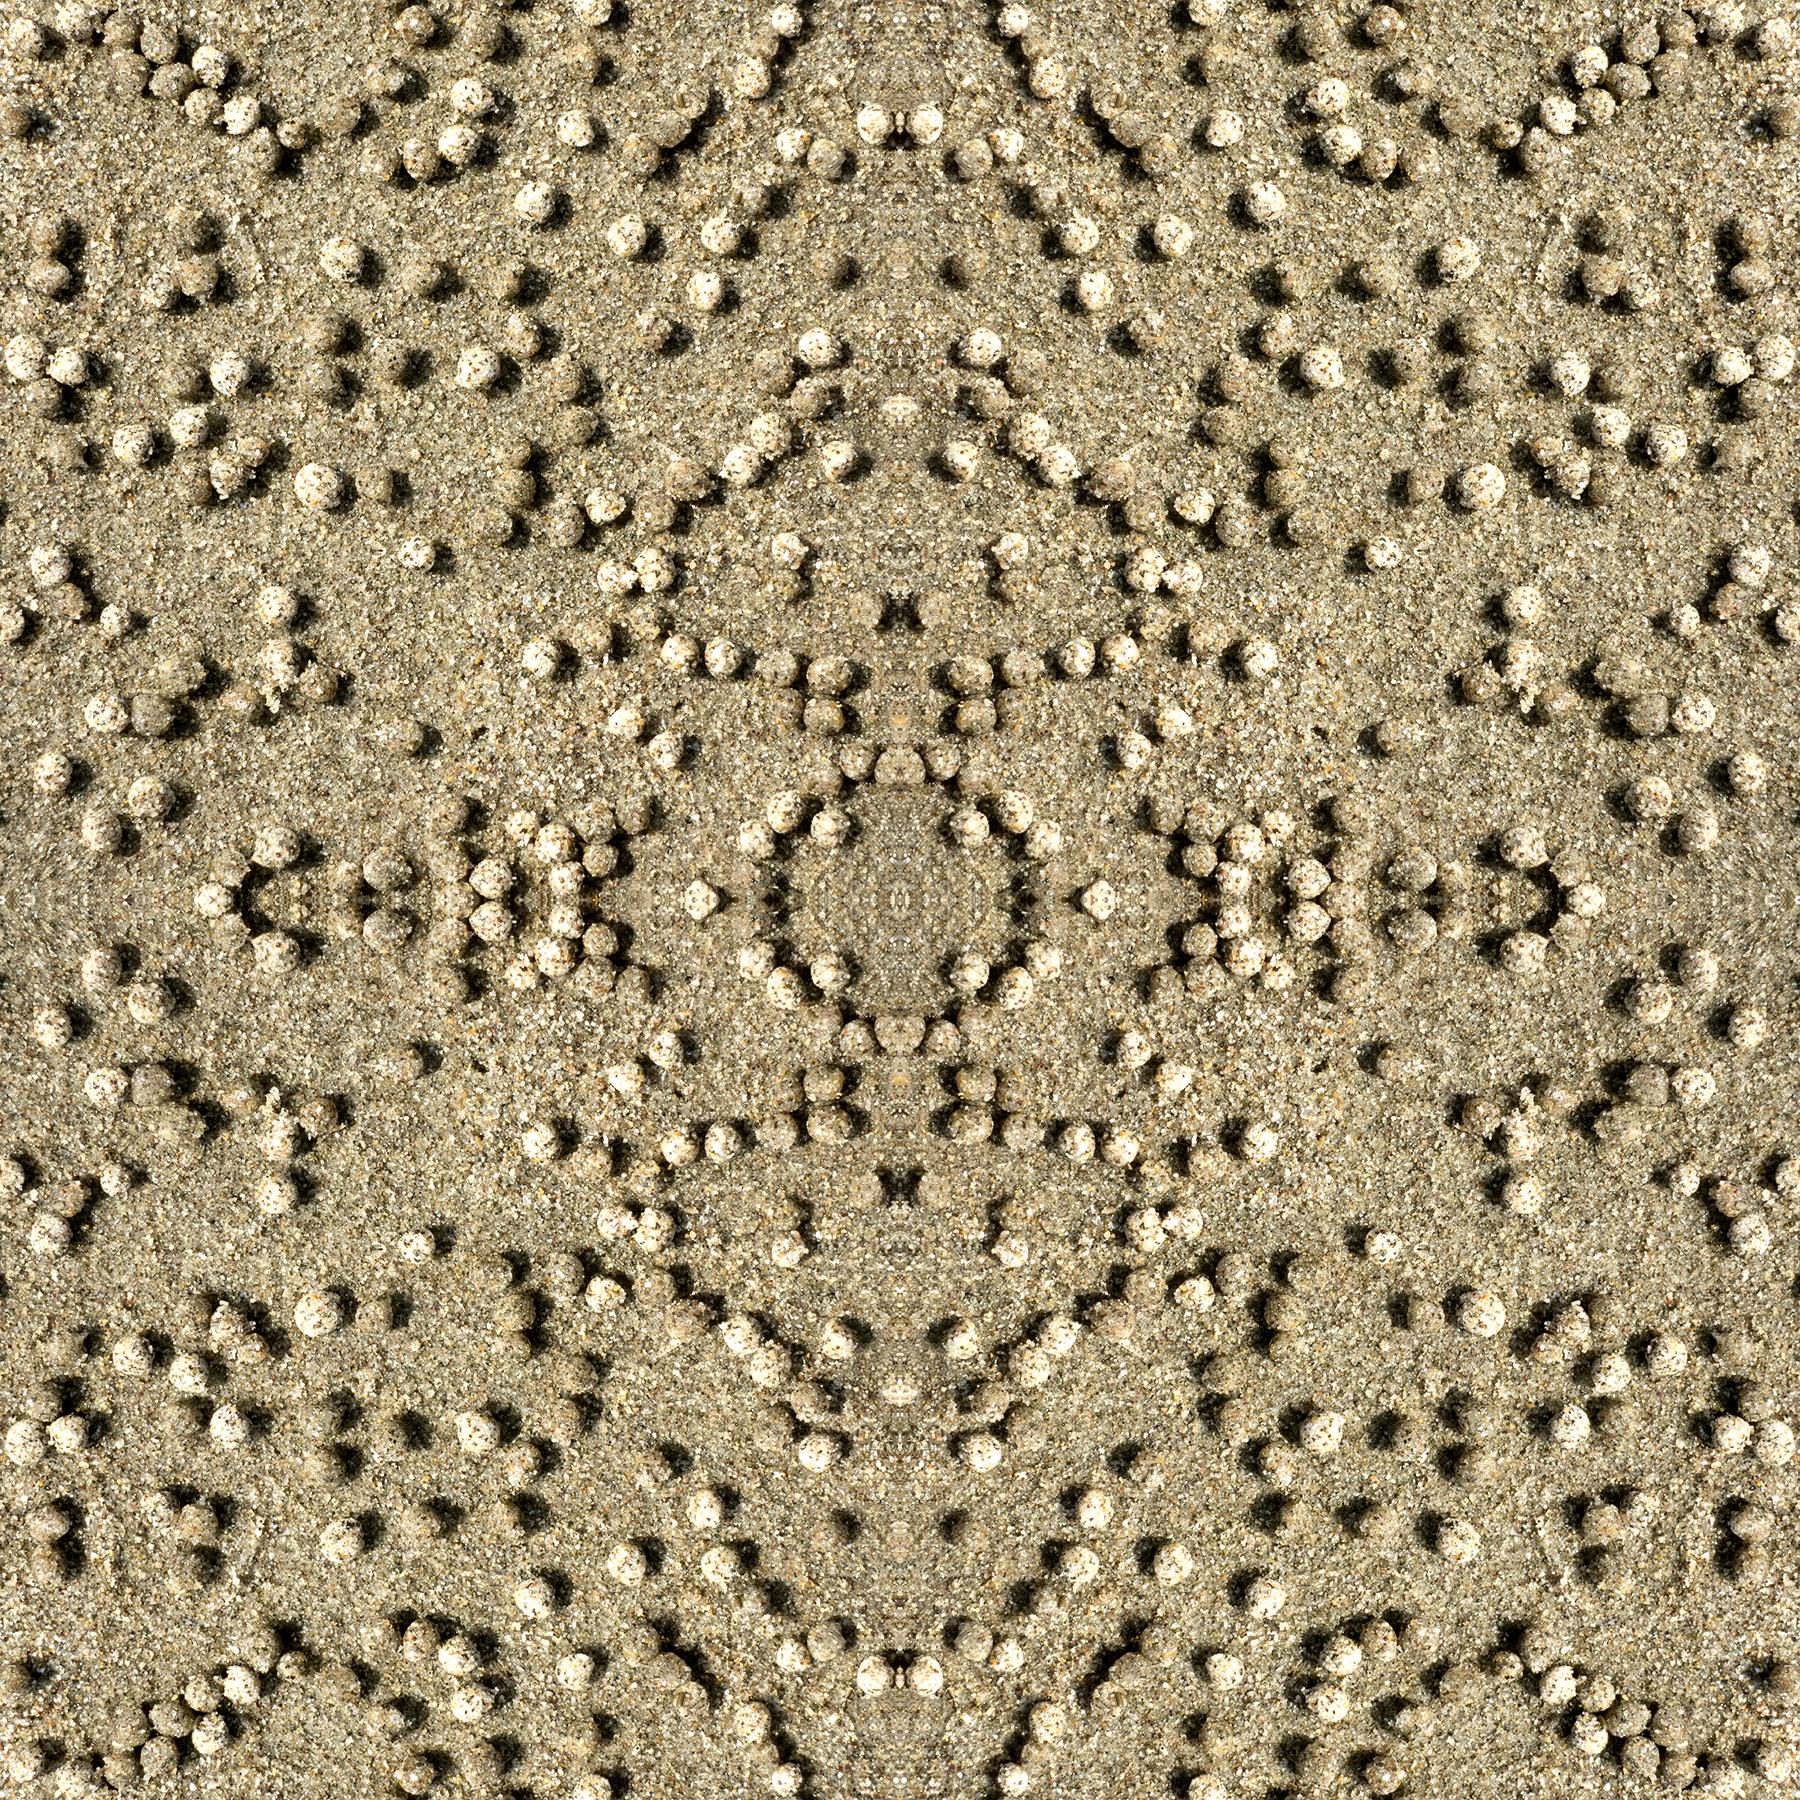 IMG_0240.square.jpg